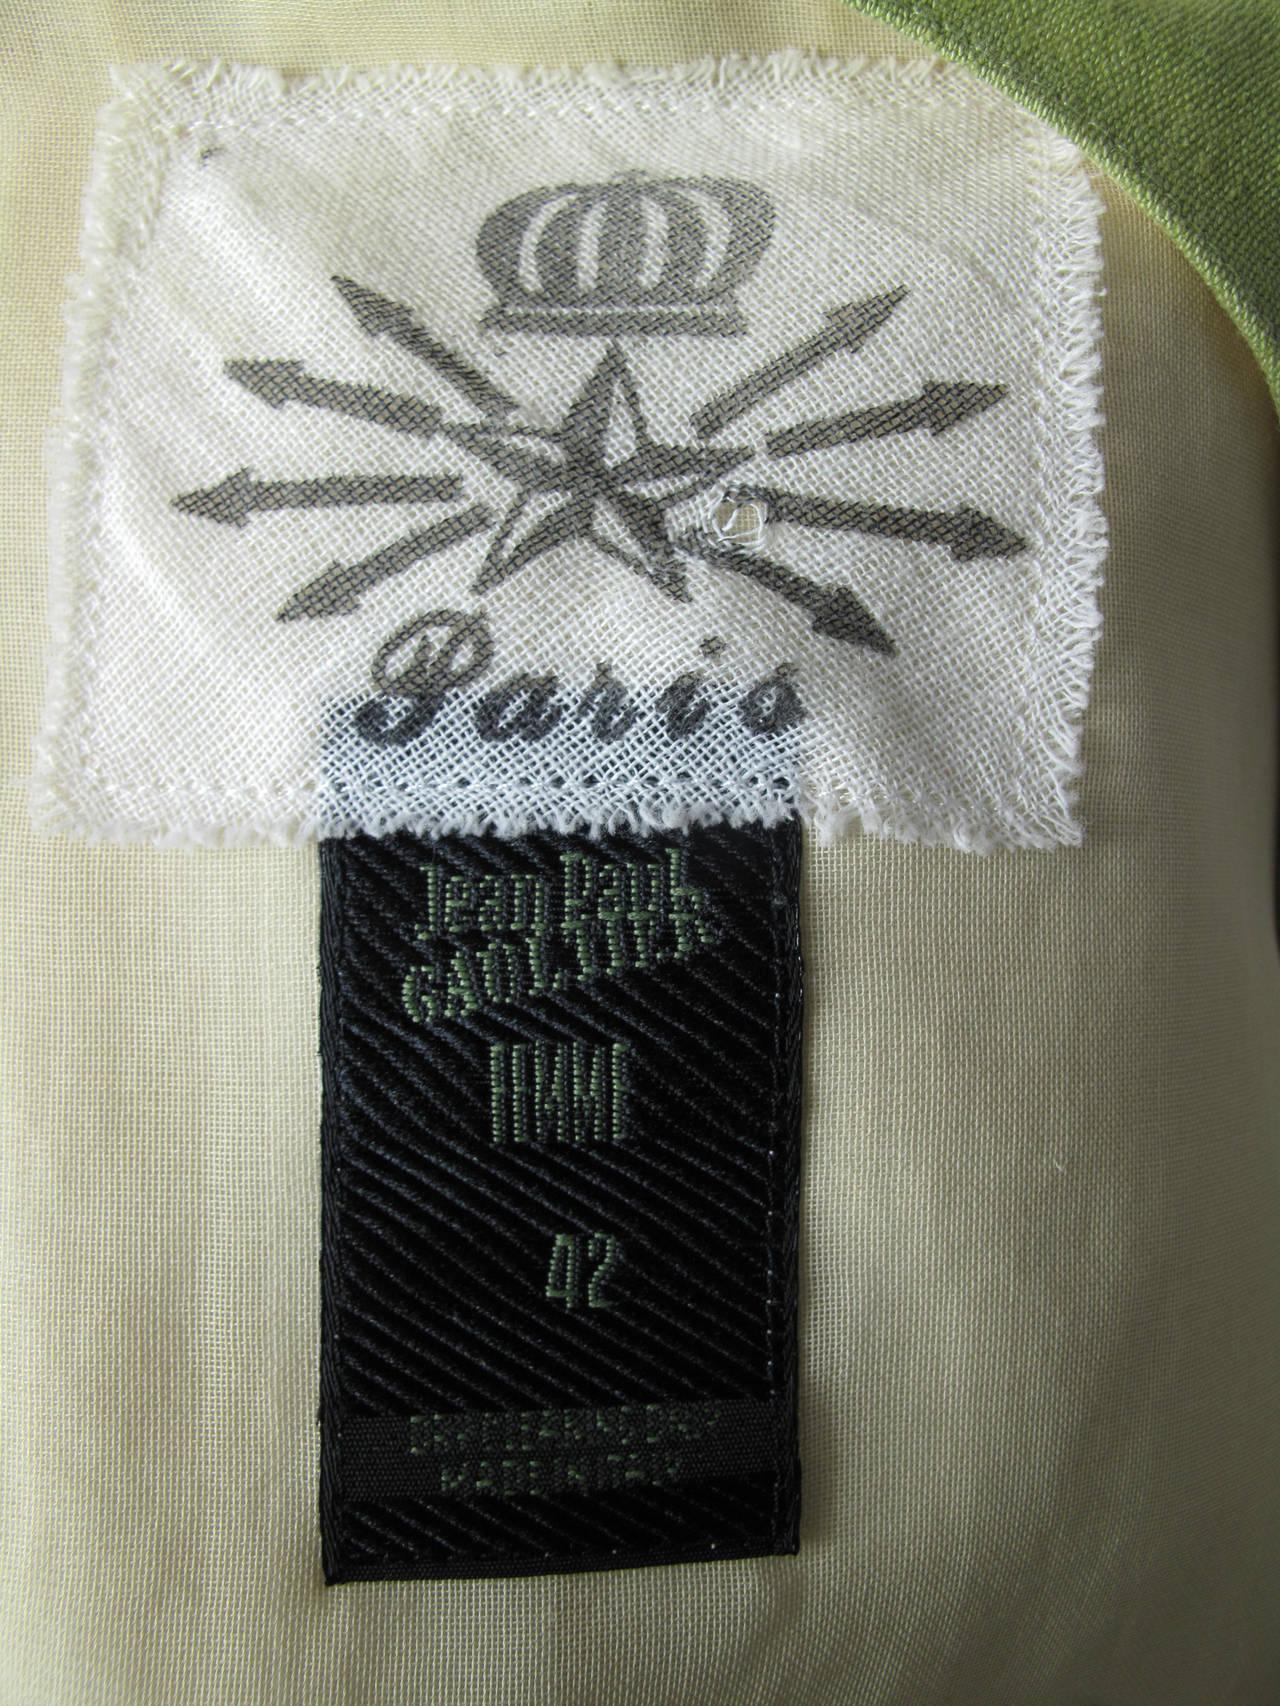 1990s Jean Paul Gaultier Sheer Blouse with Vest 5